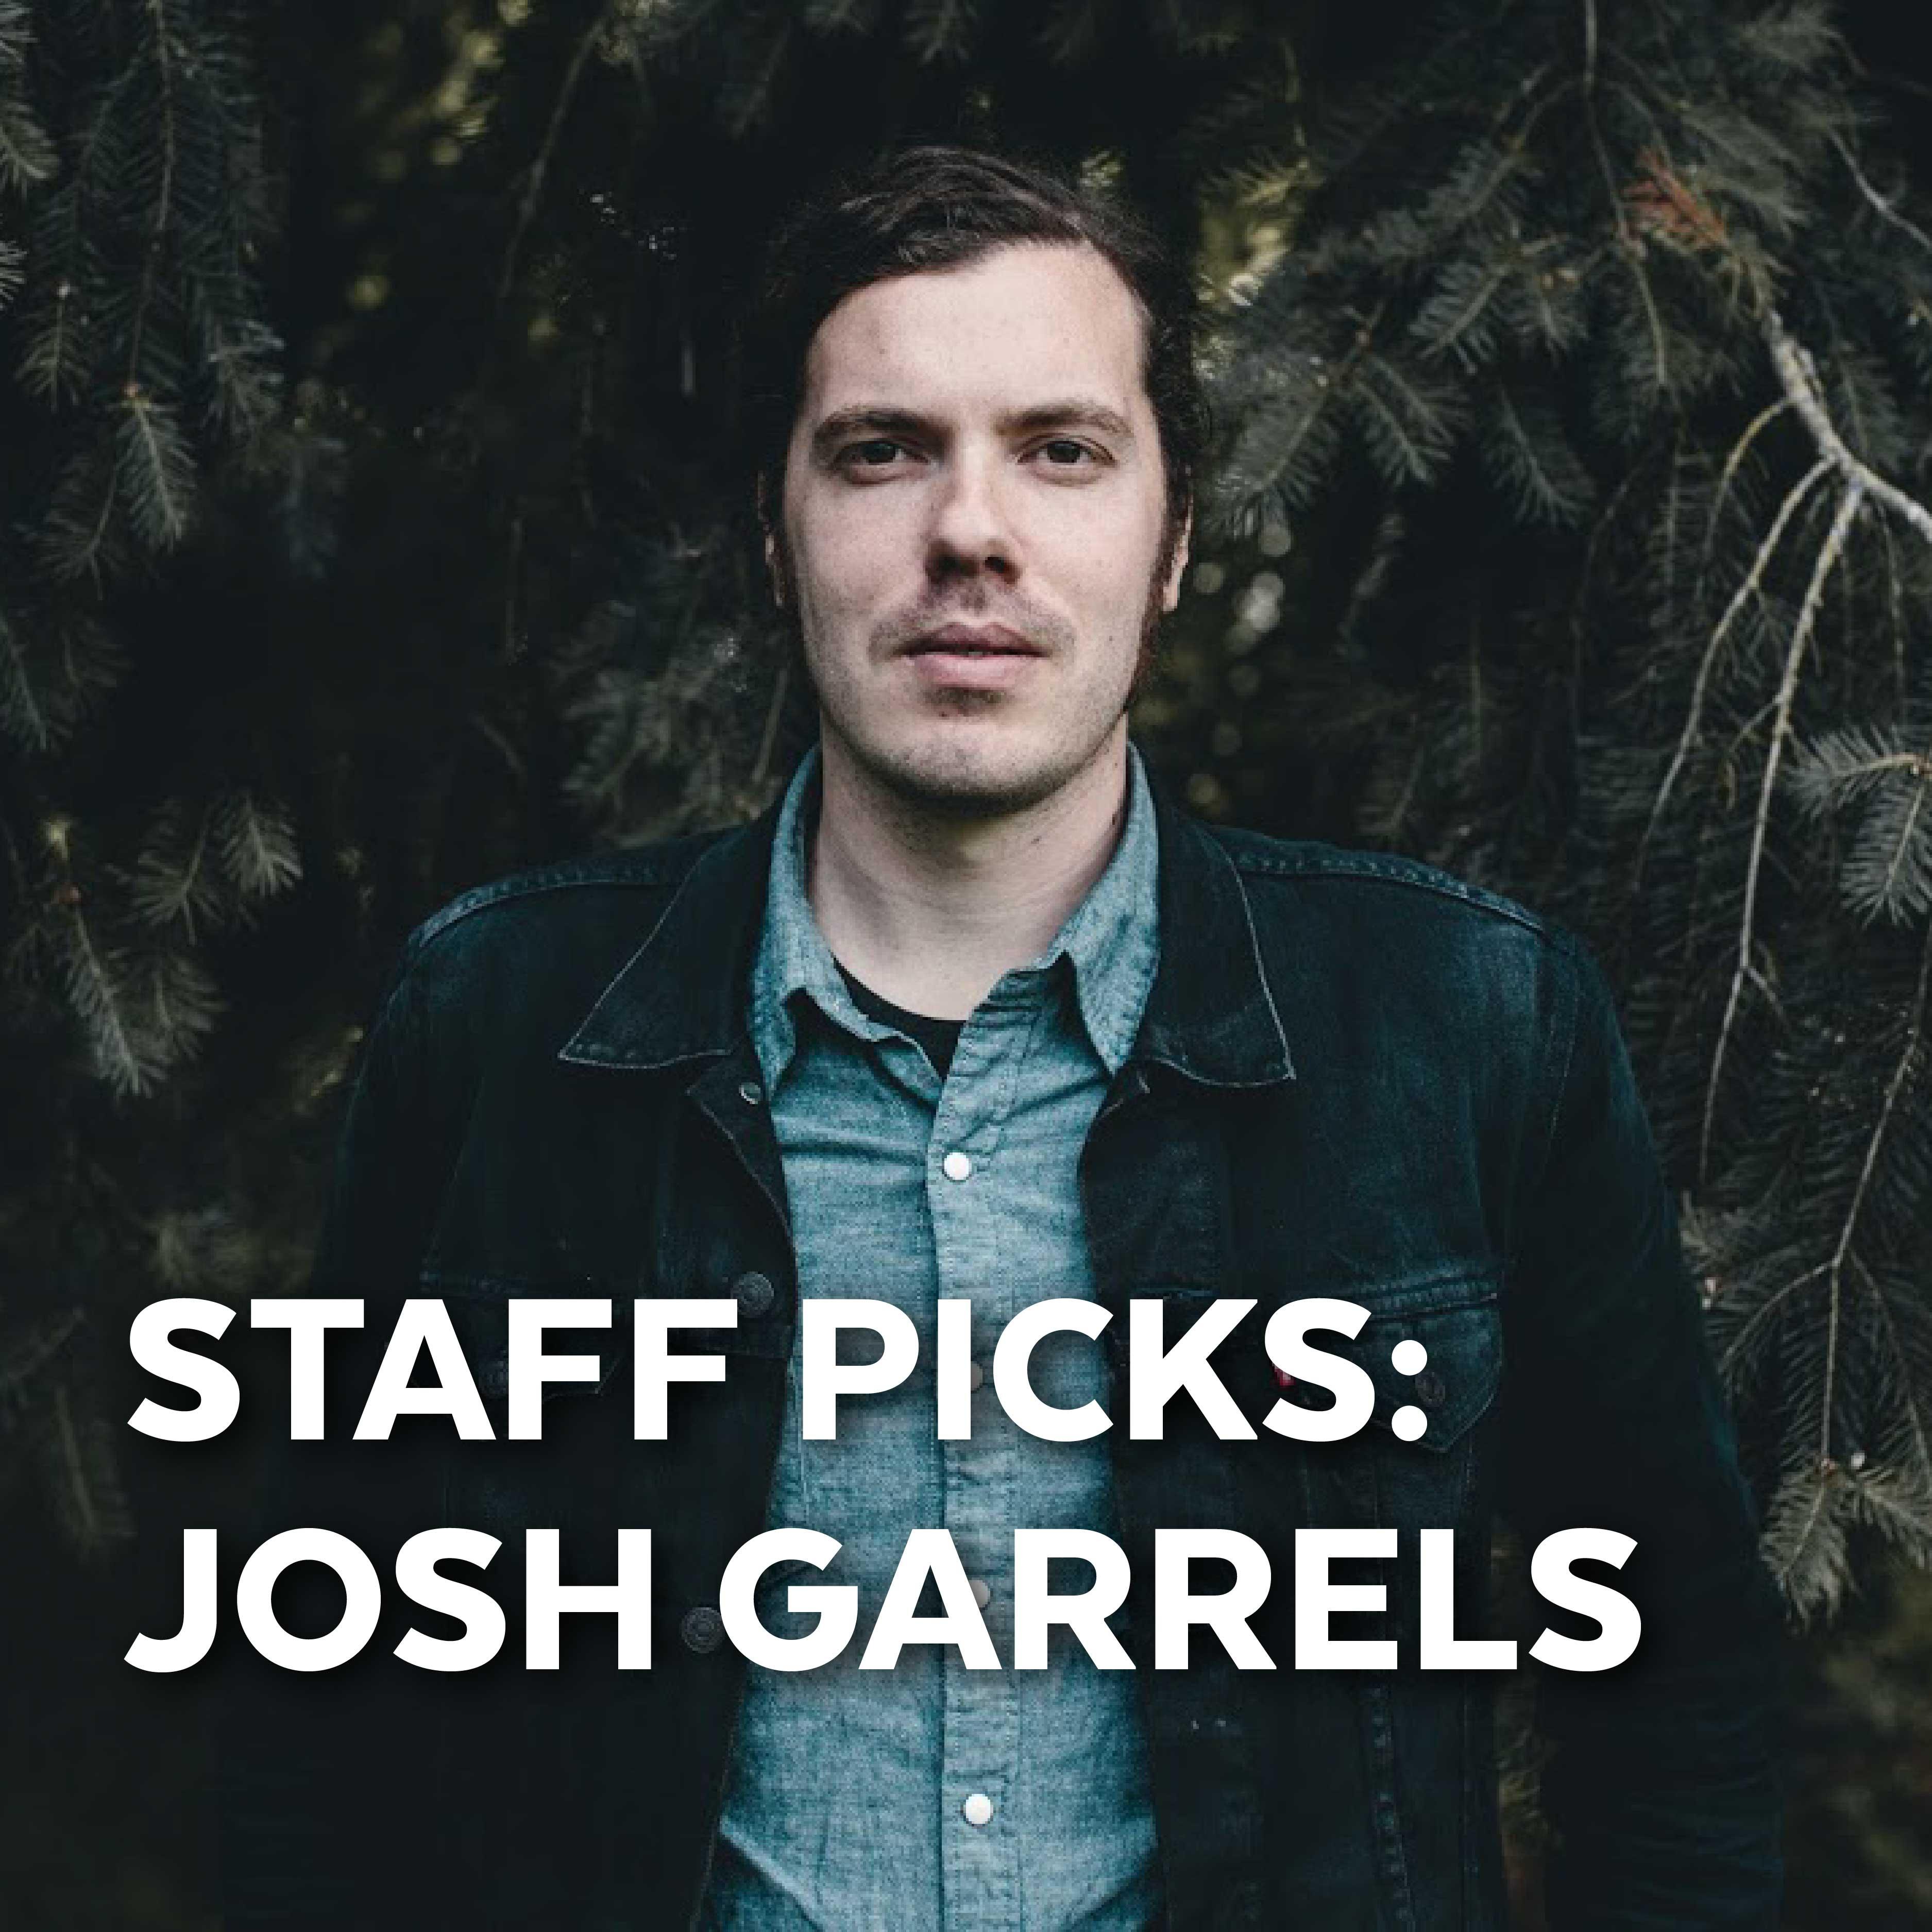 StaffPick_JoshGarrels-01.jpg